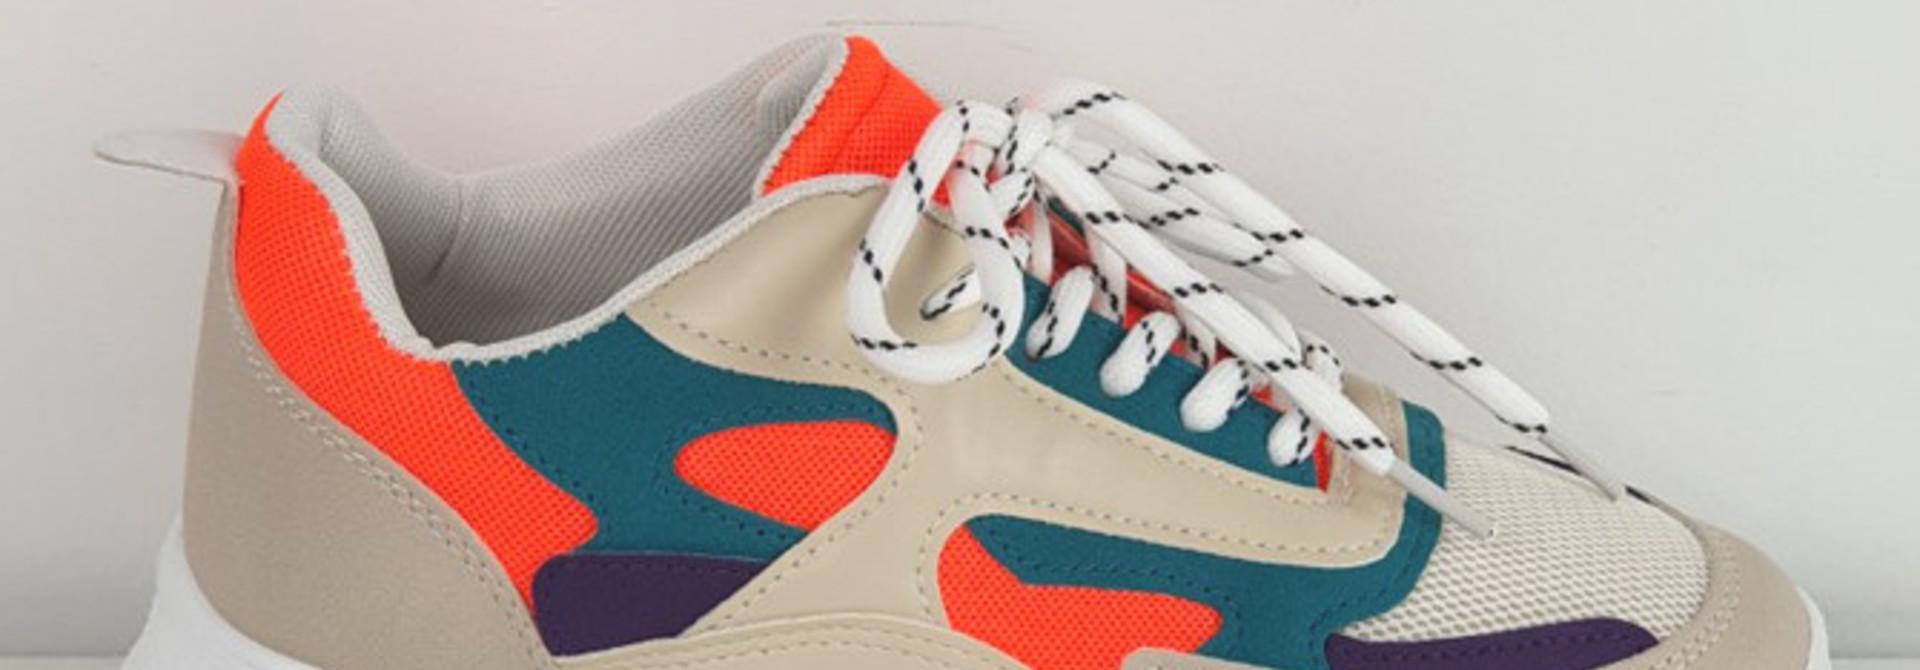 Rusty sneakers Orange